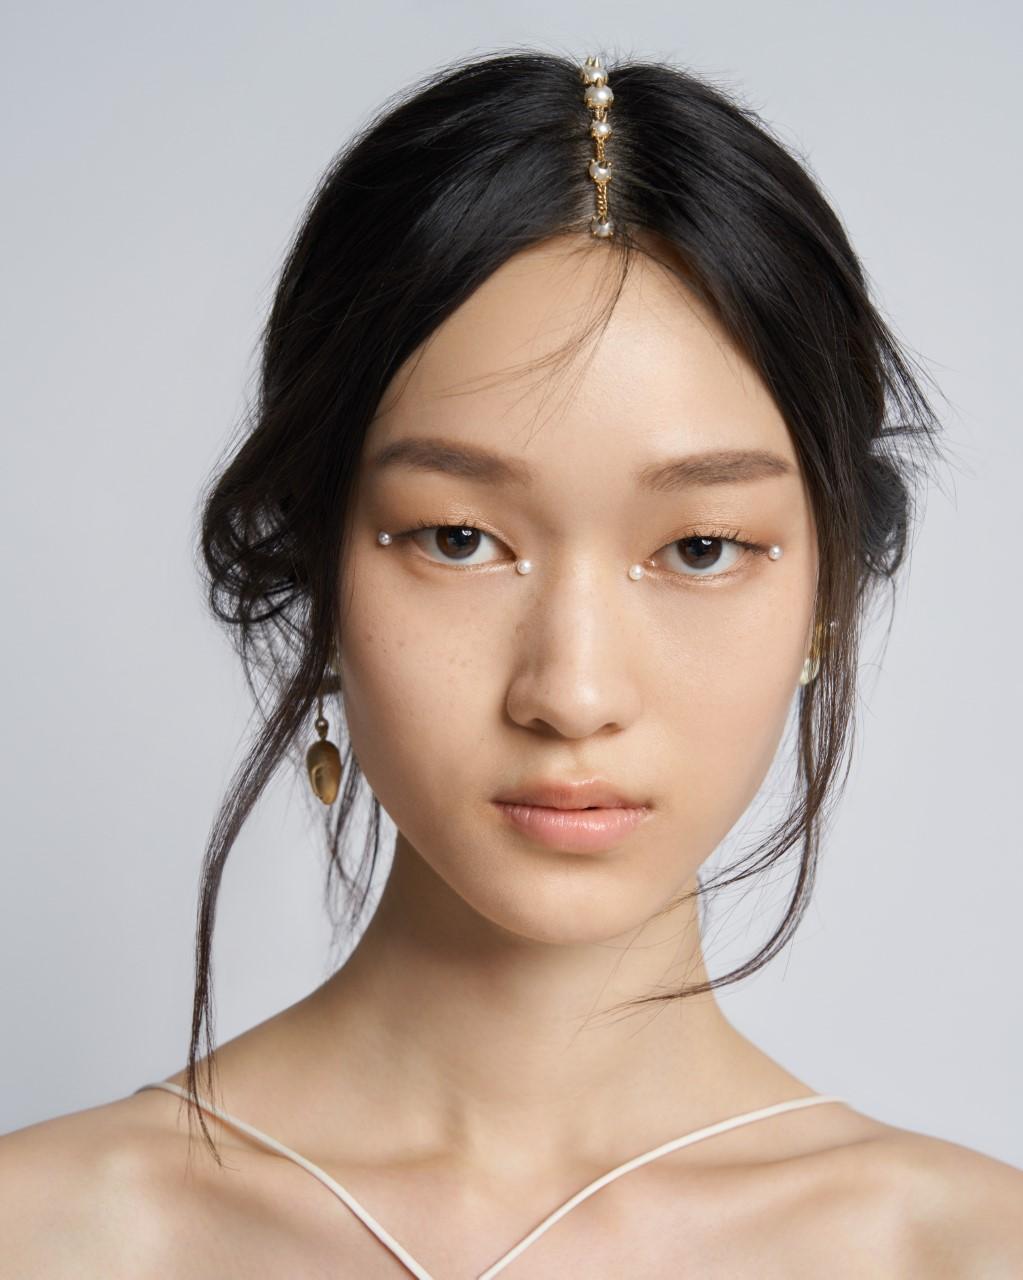 Dior lanza una paleta couture en edición limitada para Dior Cruise 2022